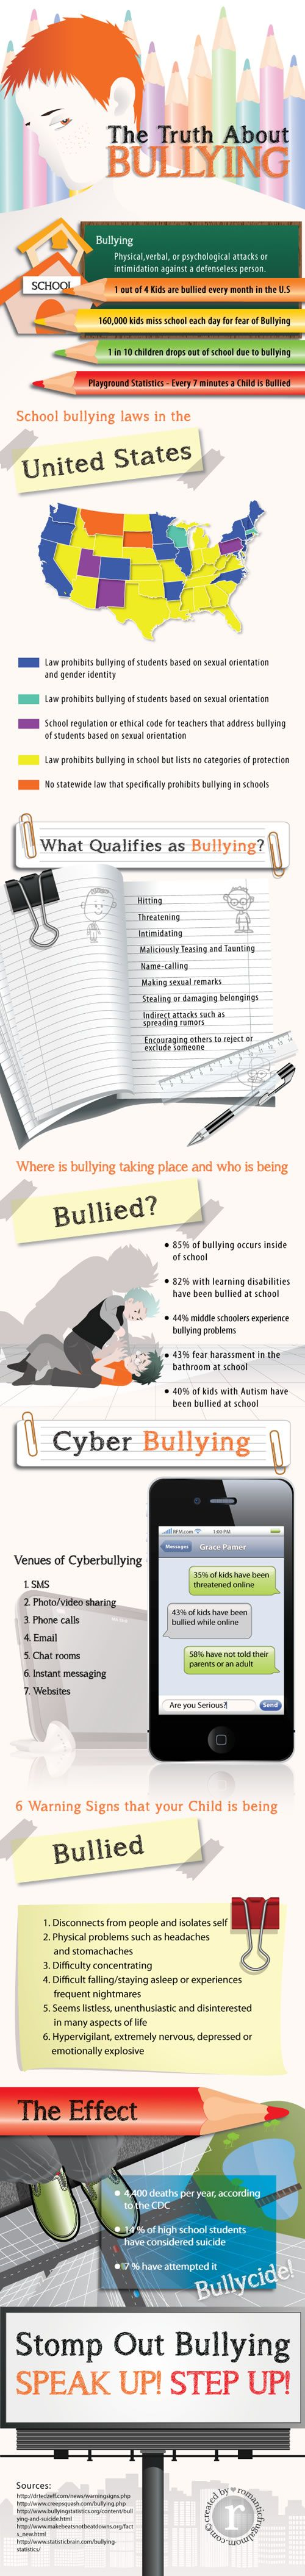 bullyingInfographic Bullying, Middle Schools,  Internet Site,  Website, Web Site, Bullying Infographic, Anti Bullying, Classroom Management, Antibullying